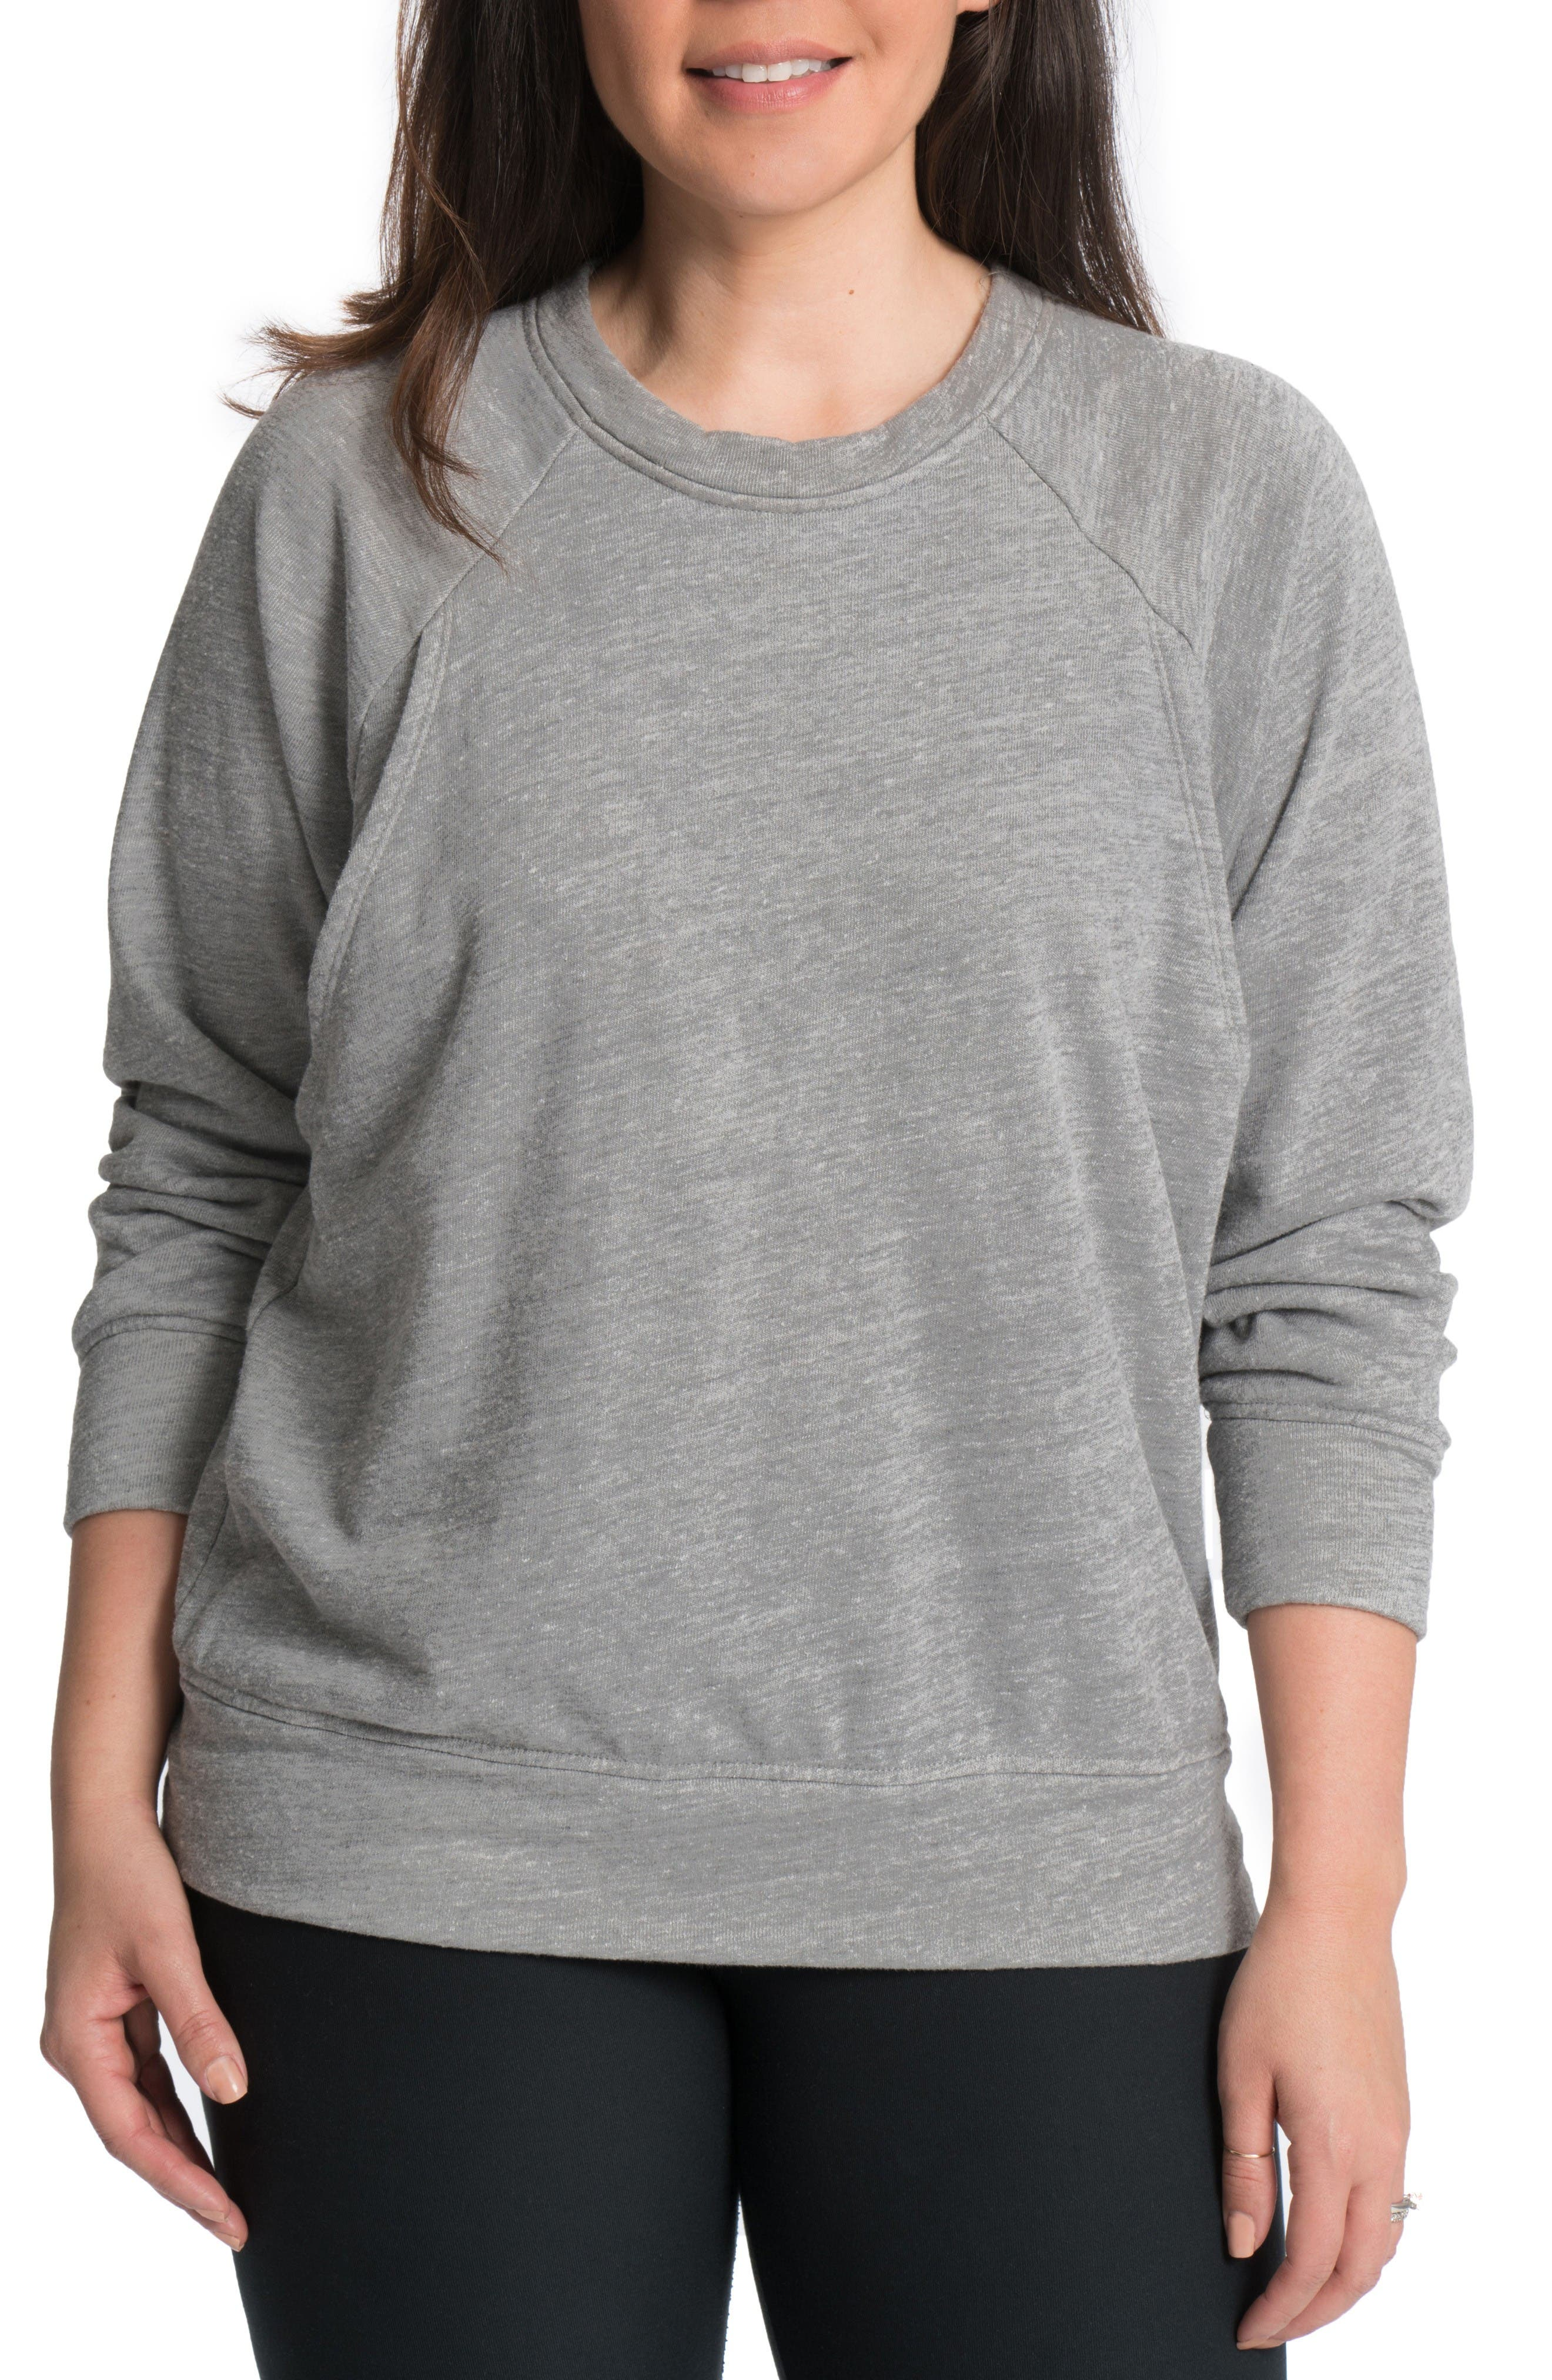 Main Image - Bun Maternity Relaxed Daily Maternity/Nursing Sweatshirt